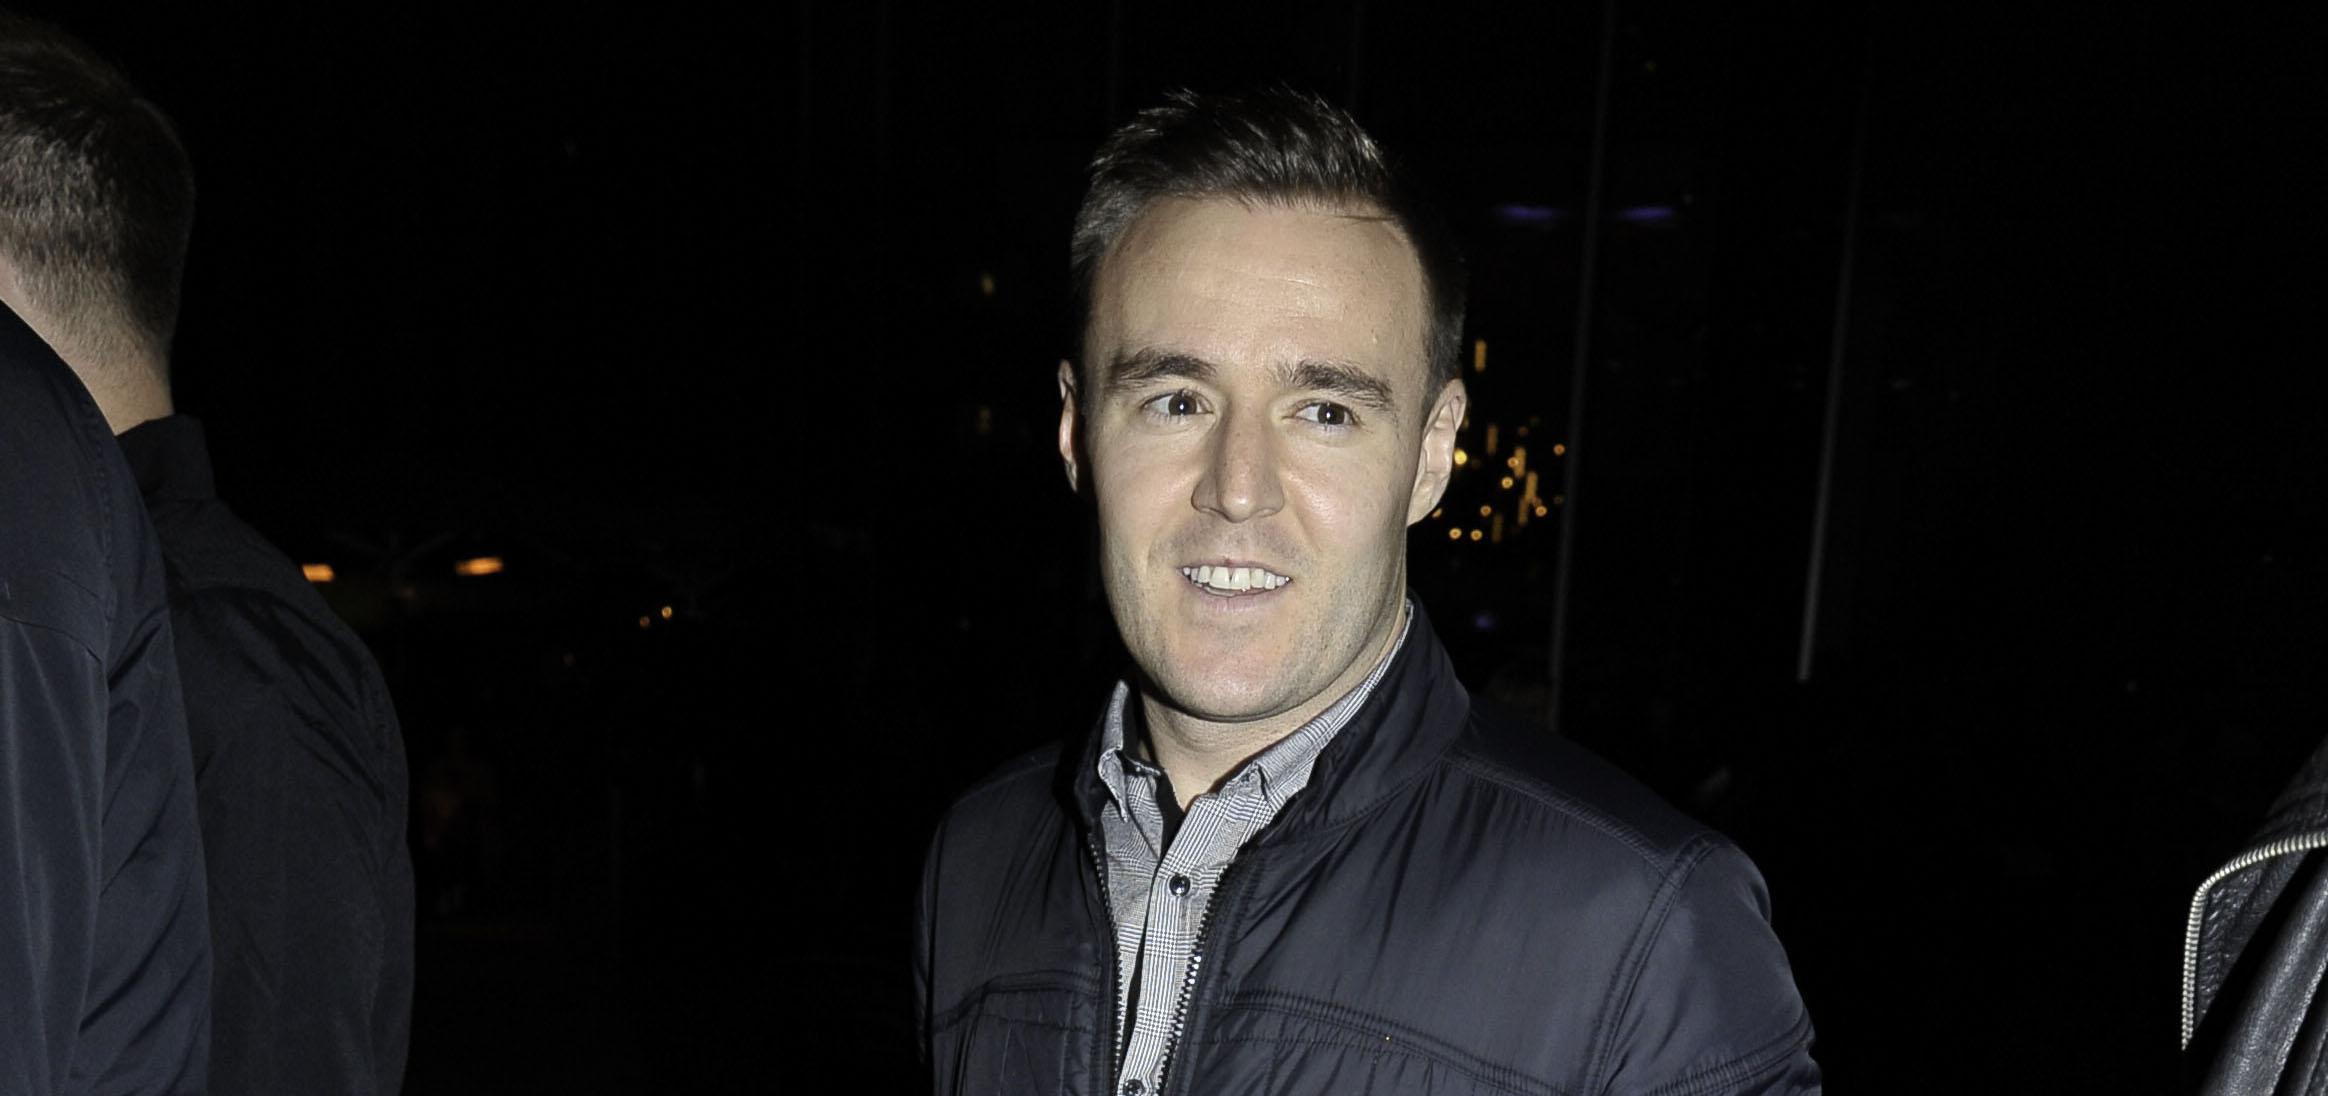 Coronation Street's Alan Halsall concerns fans with 'self-quarantine' post